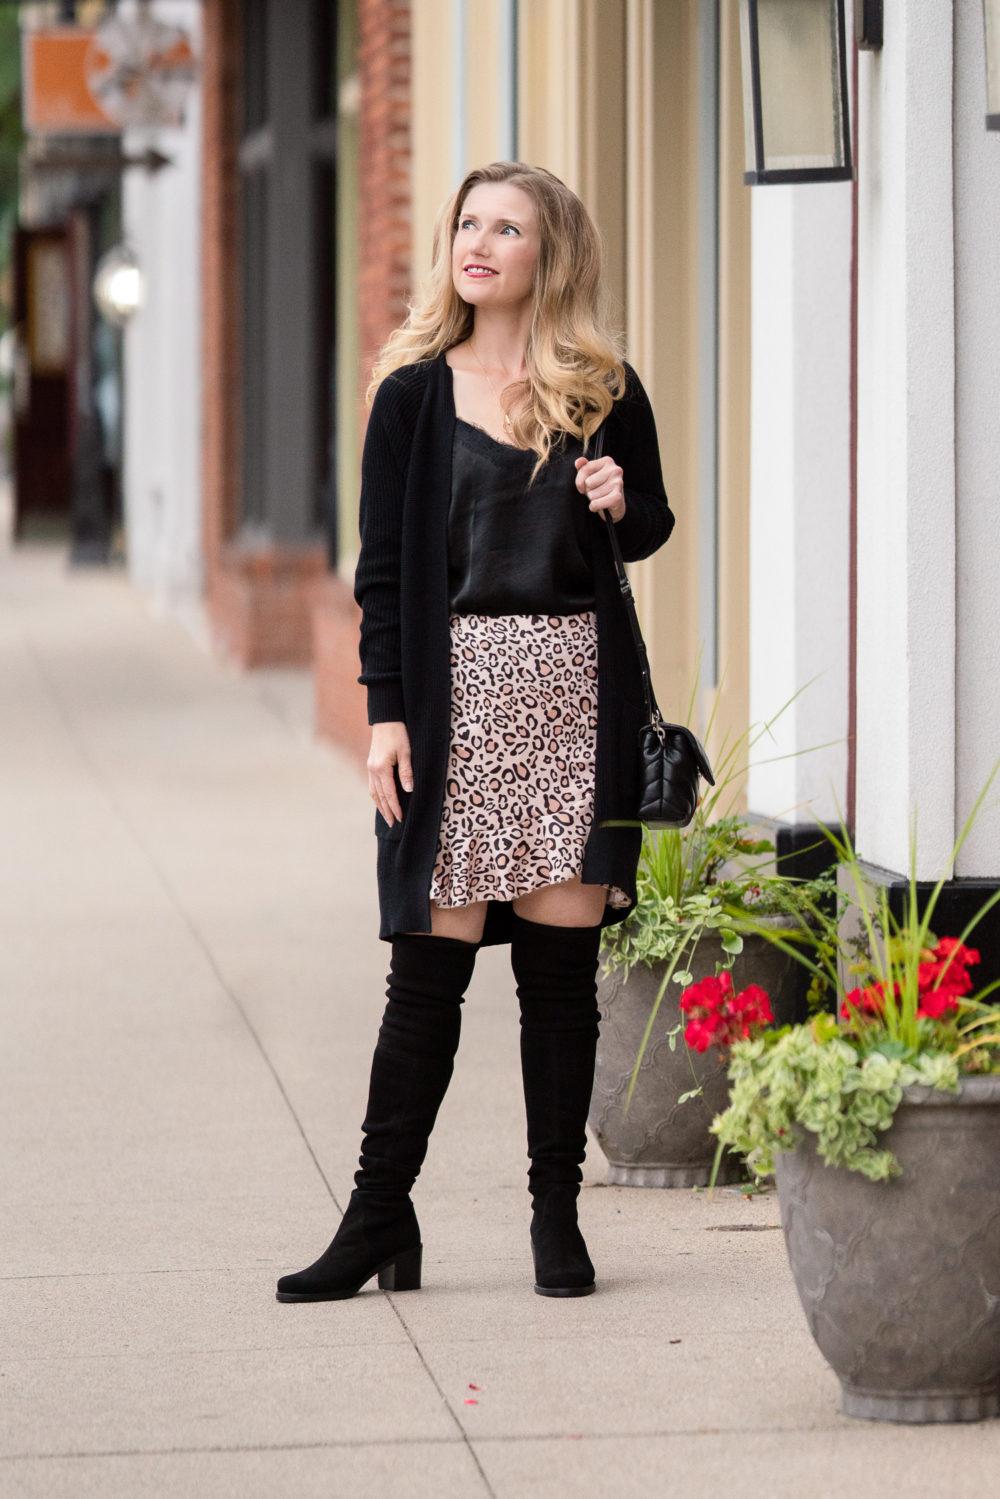 Petite Fashion Blog | Women's Leopard Asymmetrical Ruffles High Waist Mini Skirt